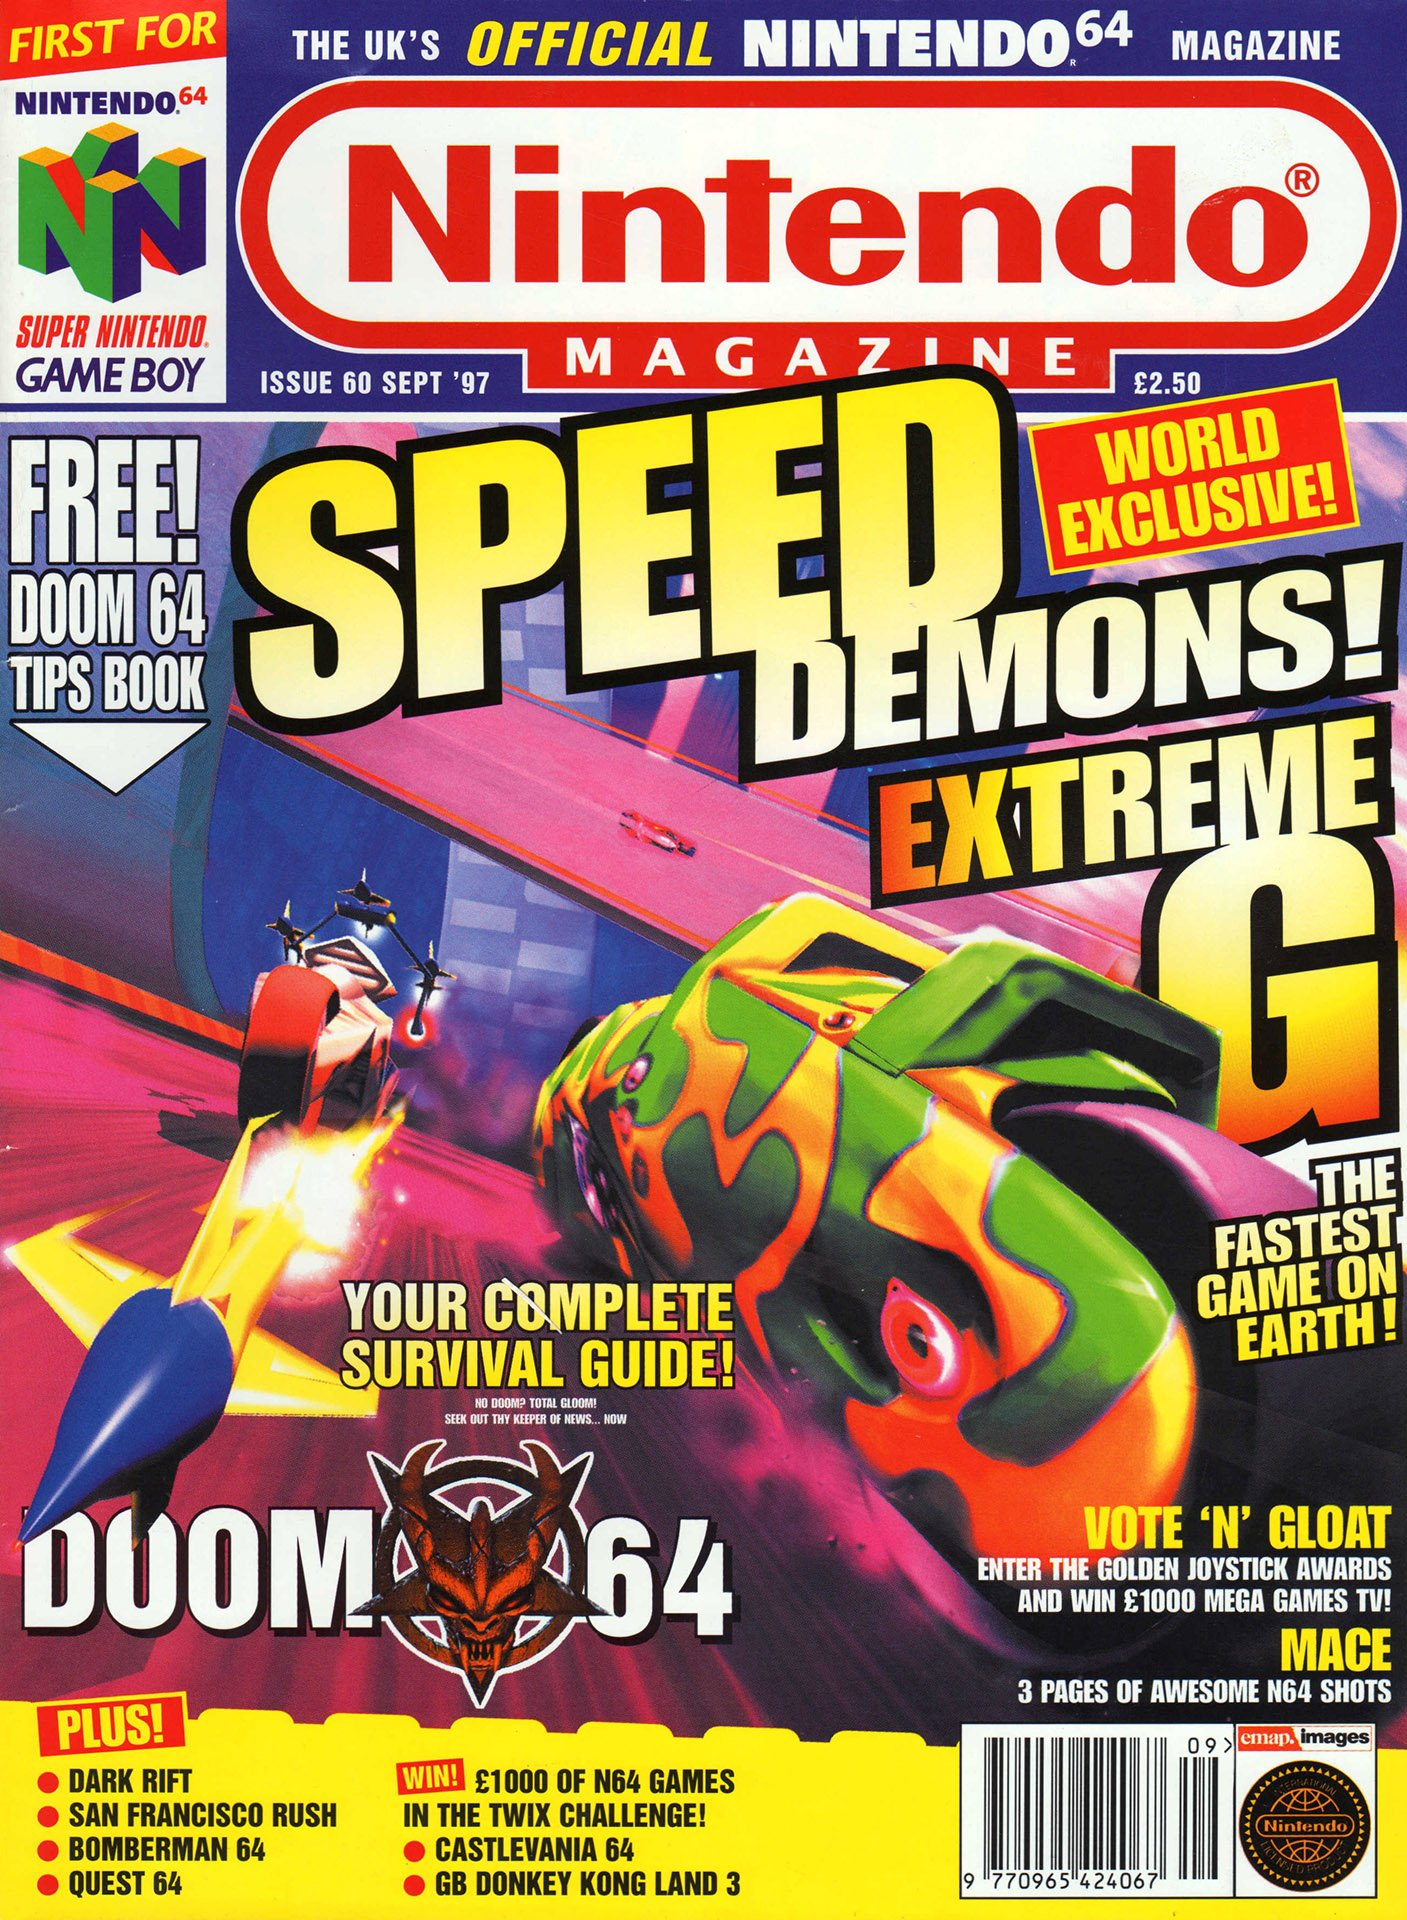 Nintendo Official Magazine 060 (September 1997)